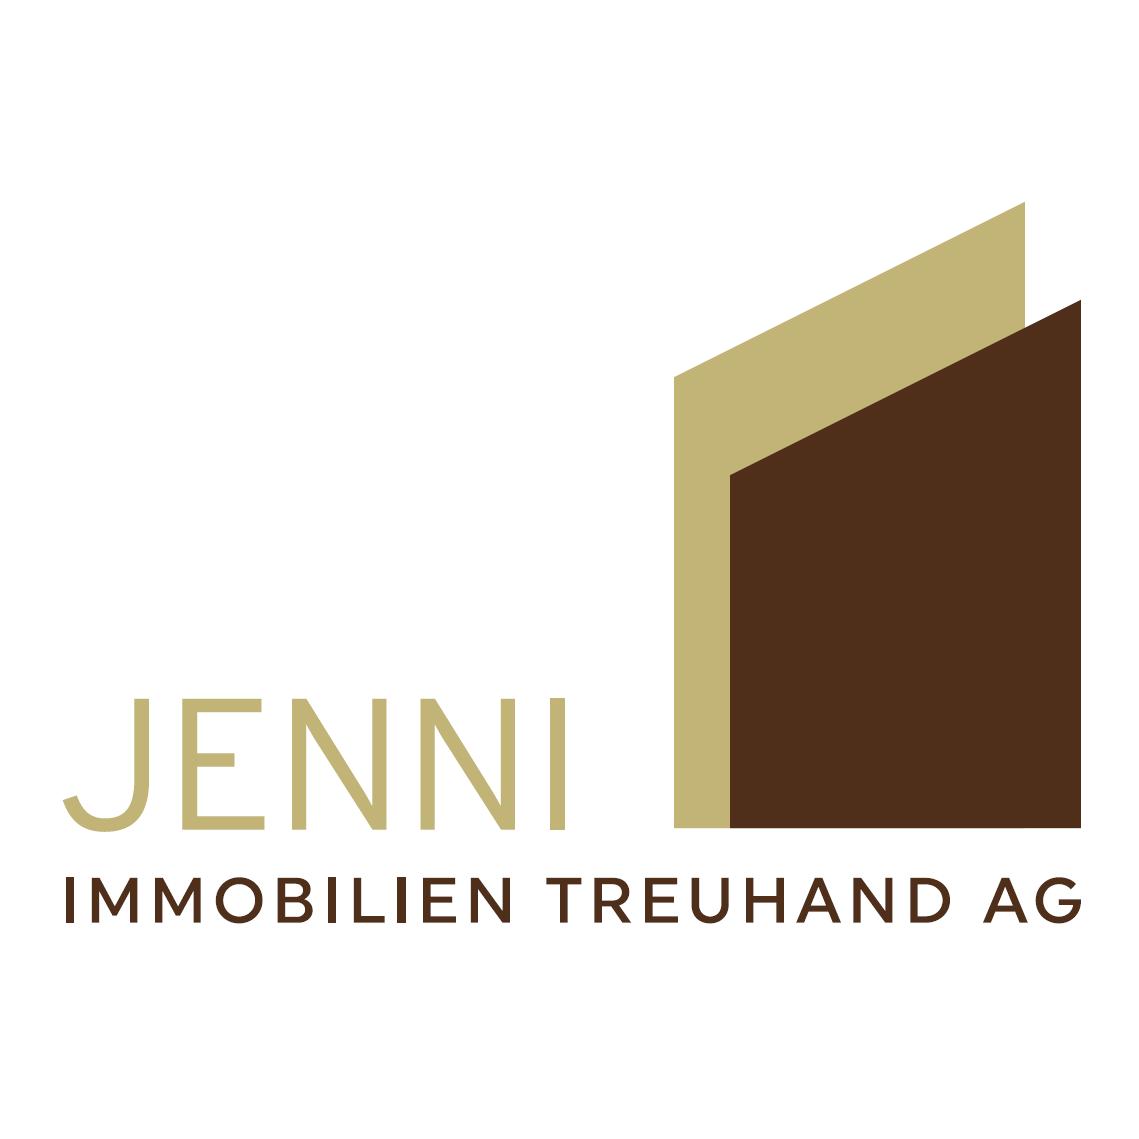 Jenni Immobilien - Treuhand AG